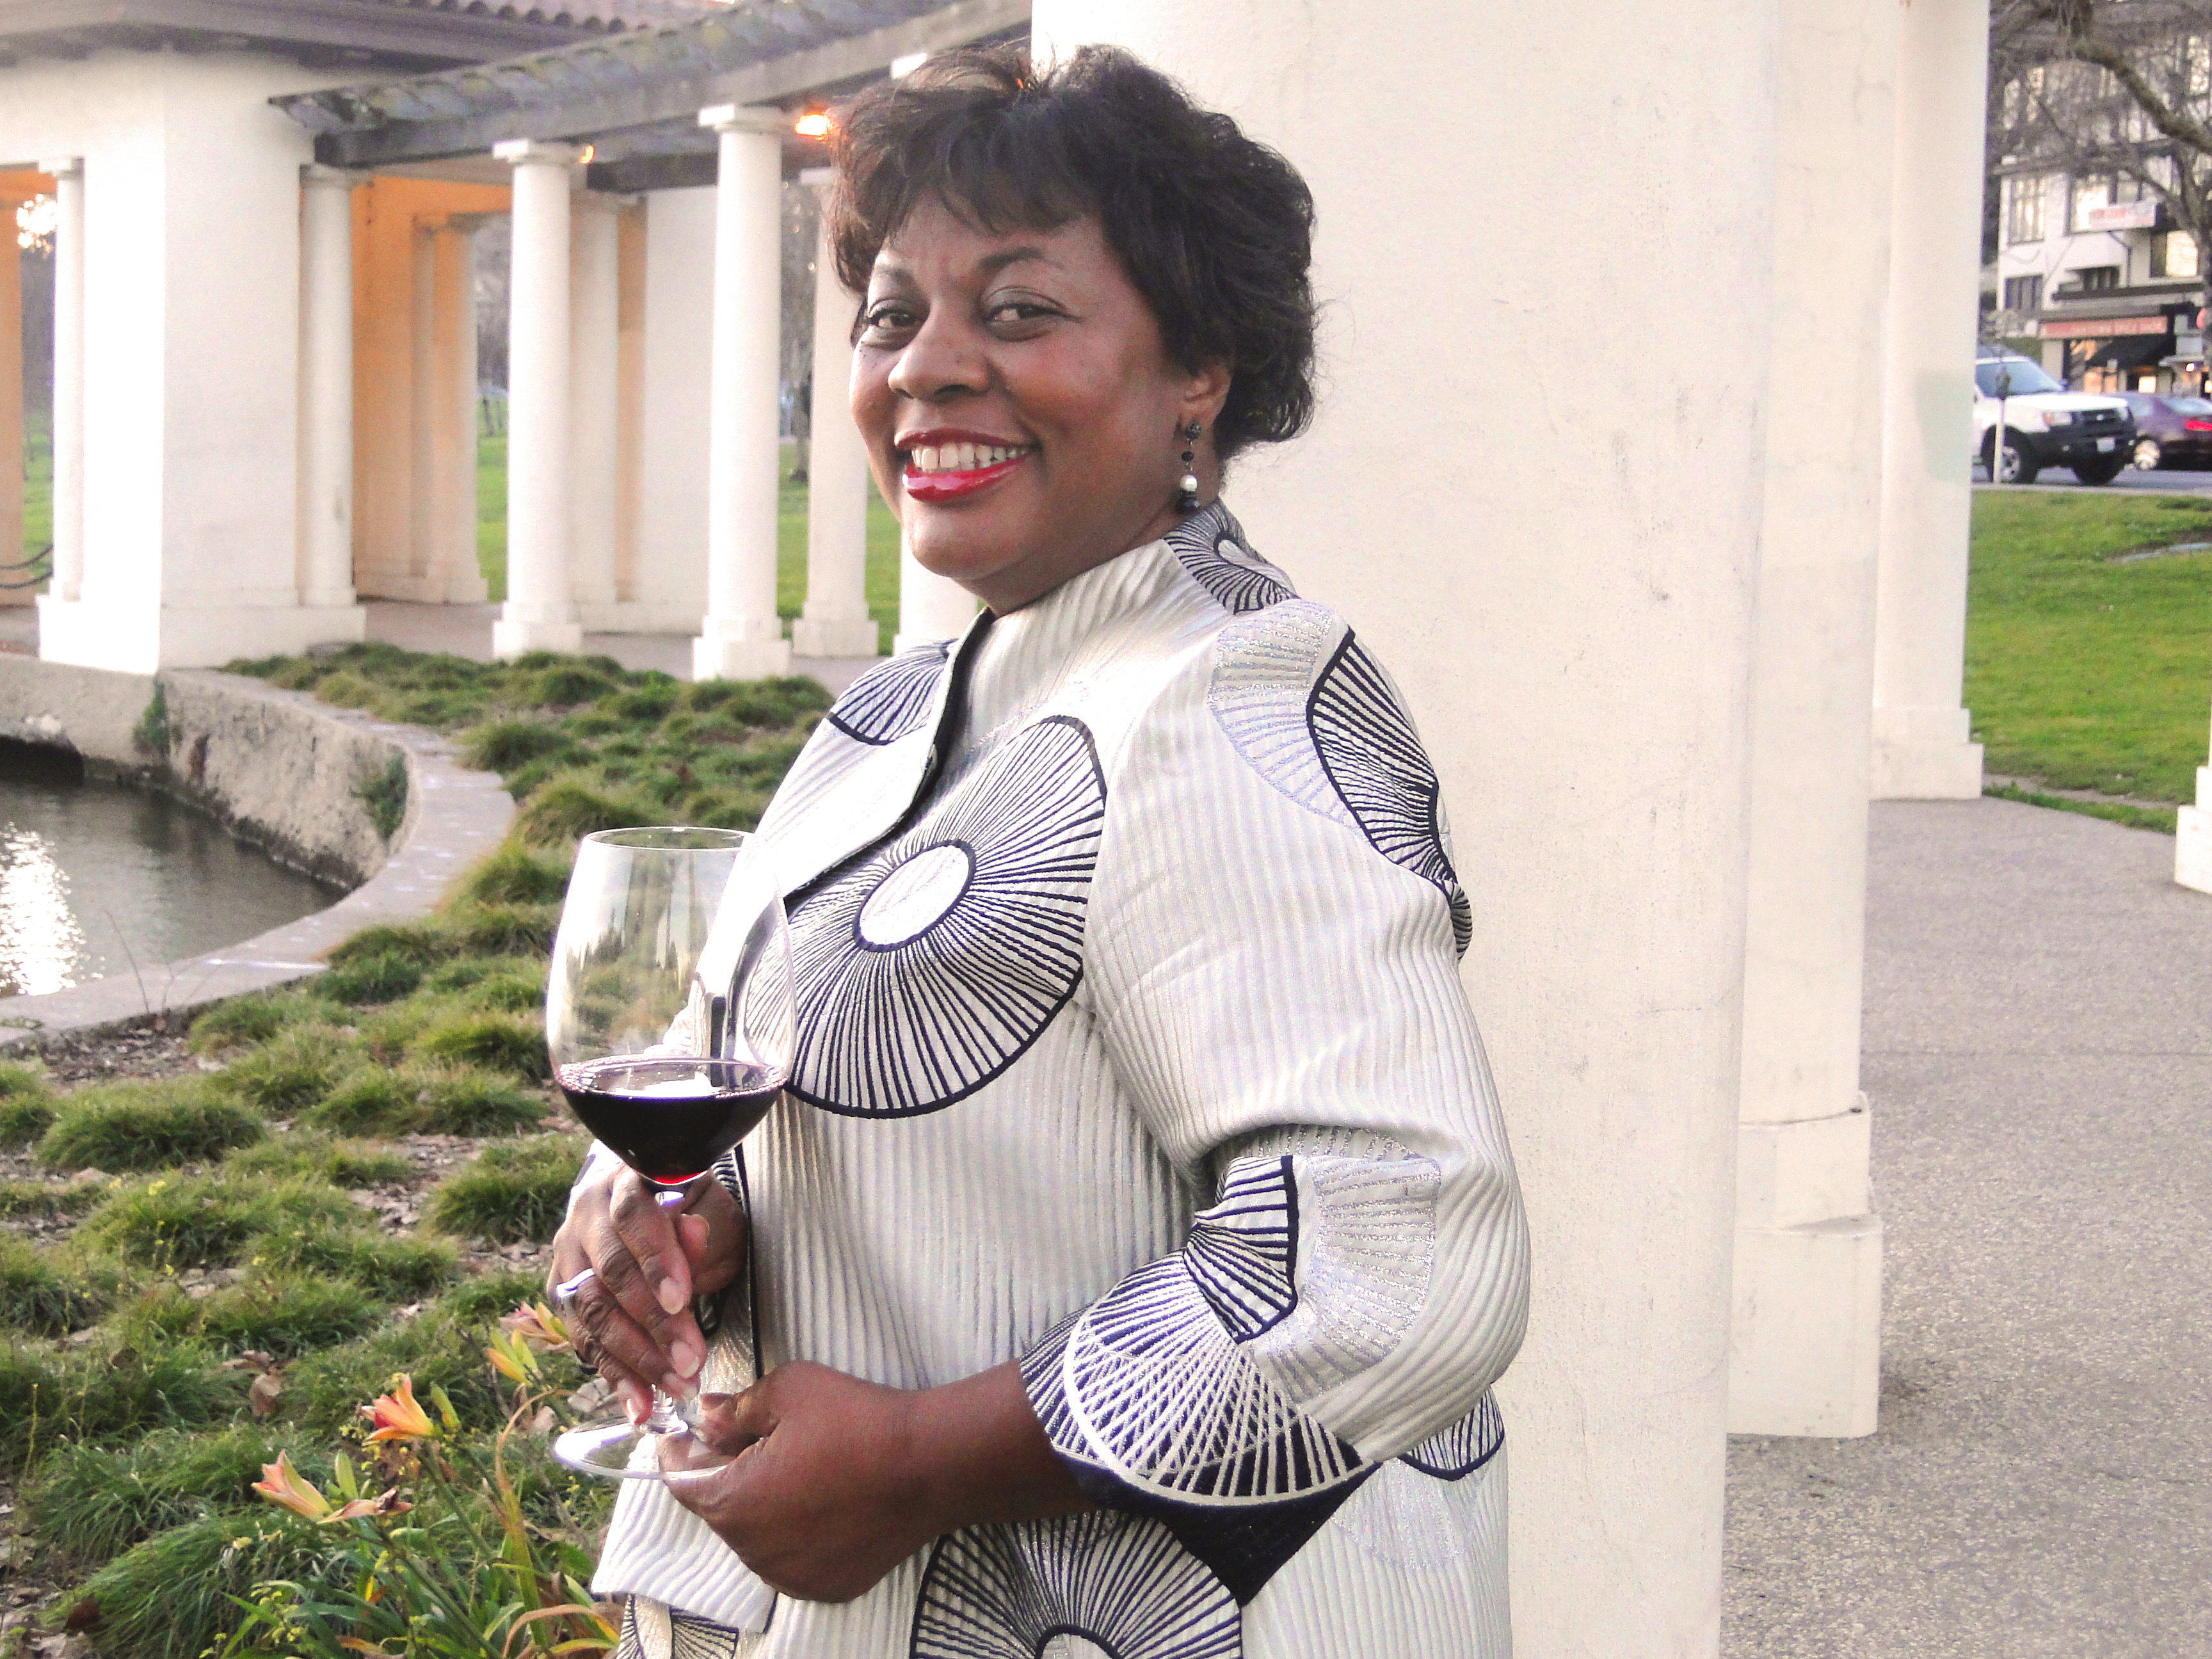 Oakland Wine Festival founder Melody Fuller on location at Lake Merritt (Photo: V. Sheree Publishing, LLC)